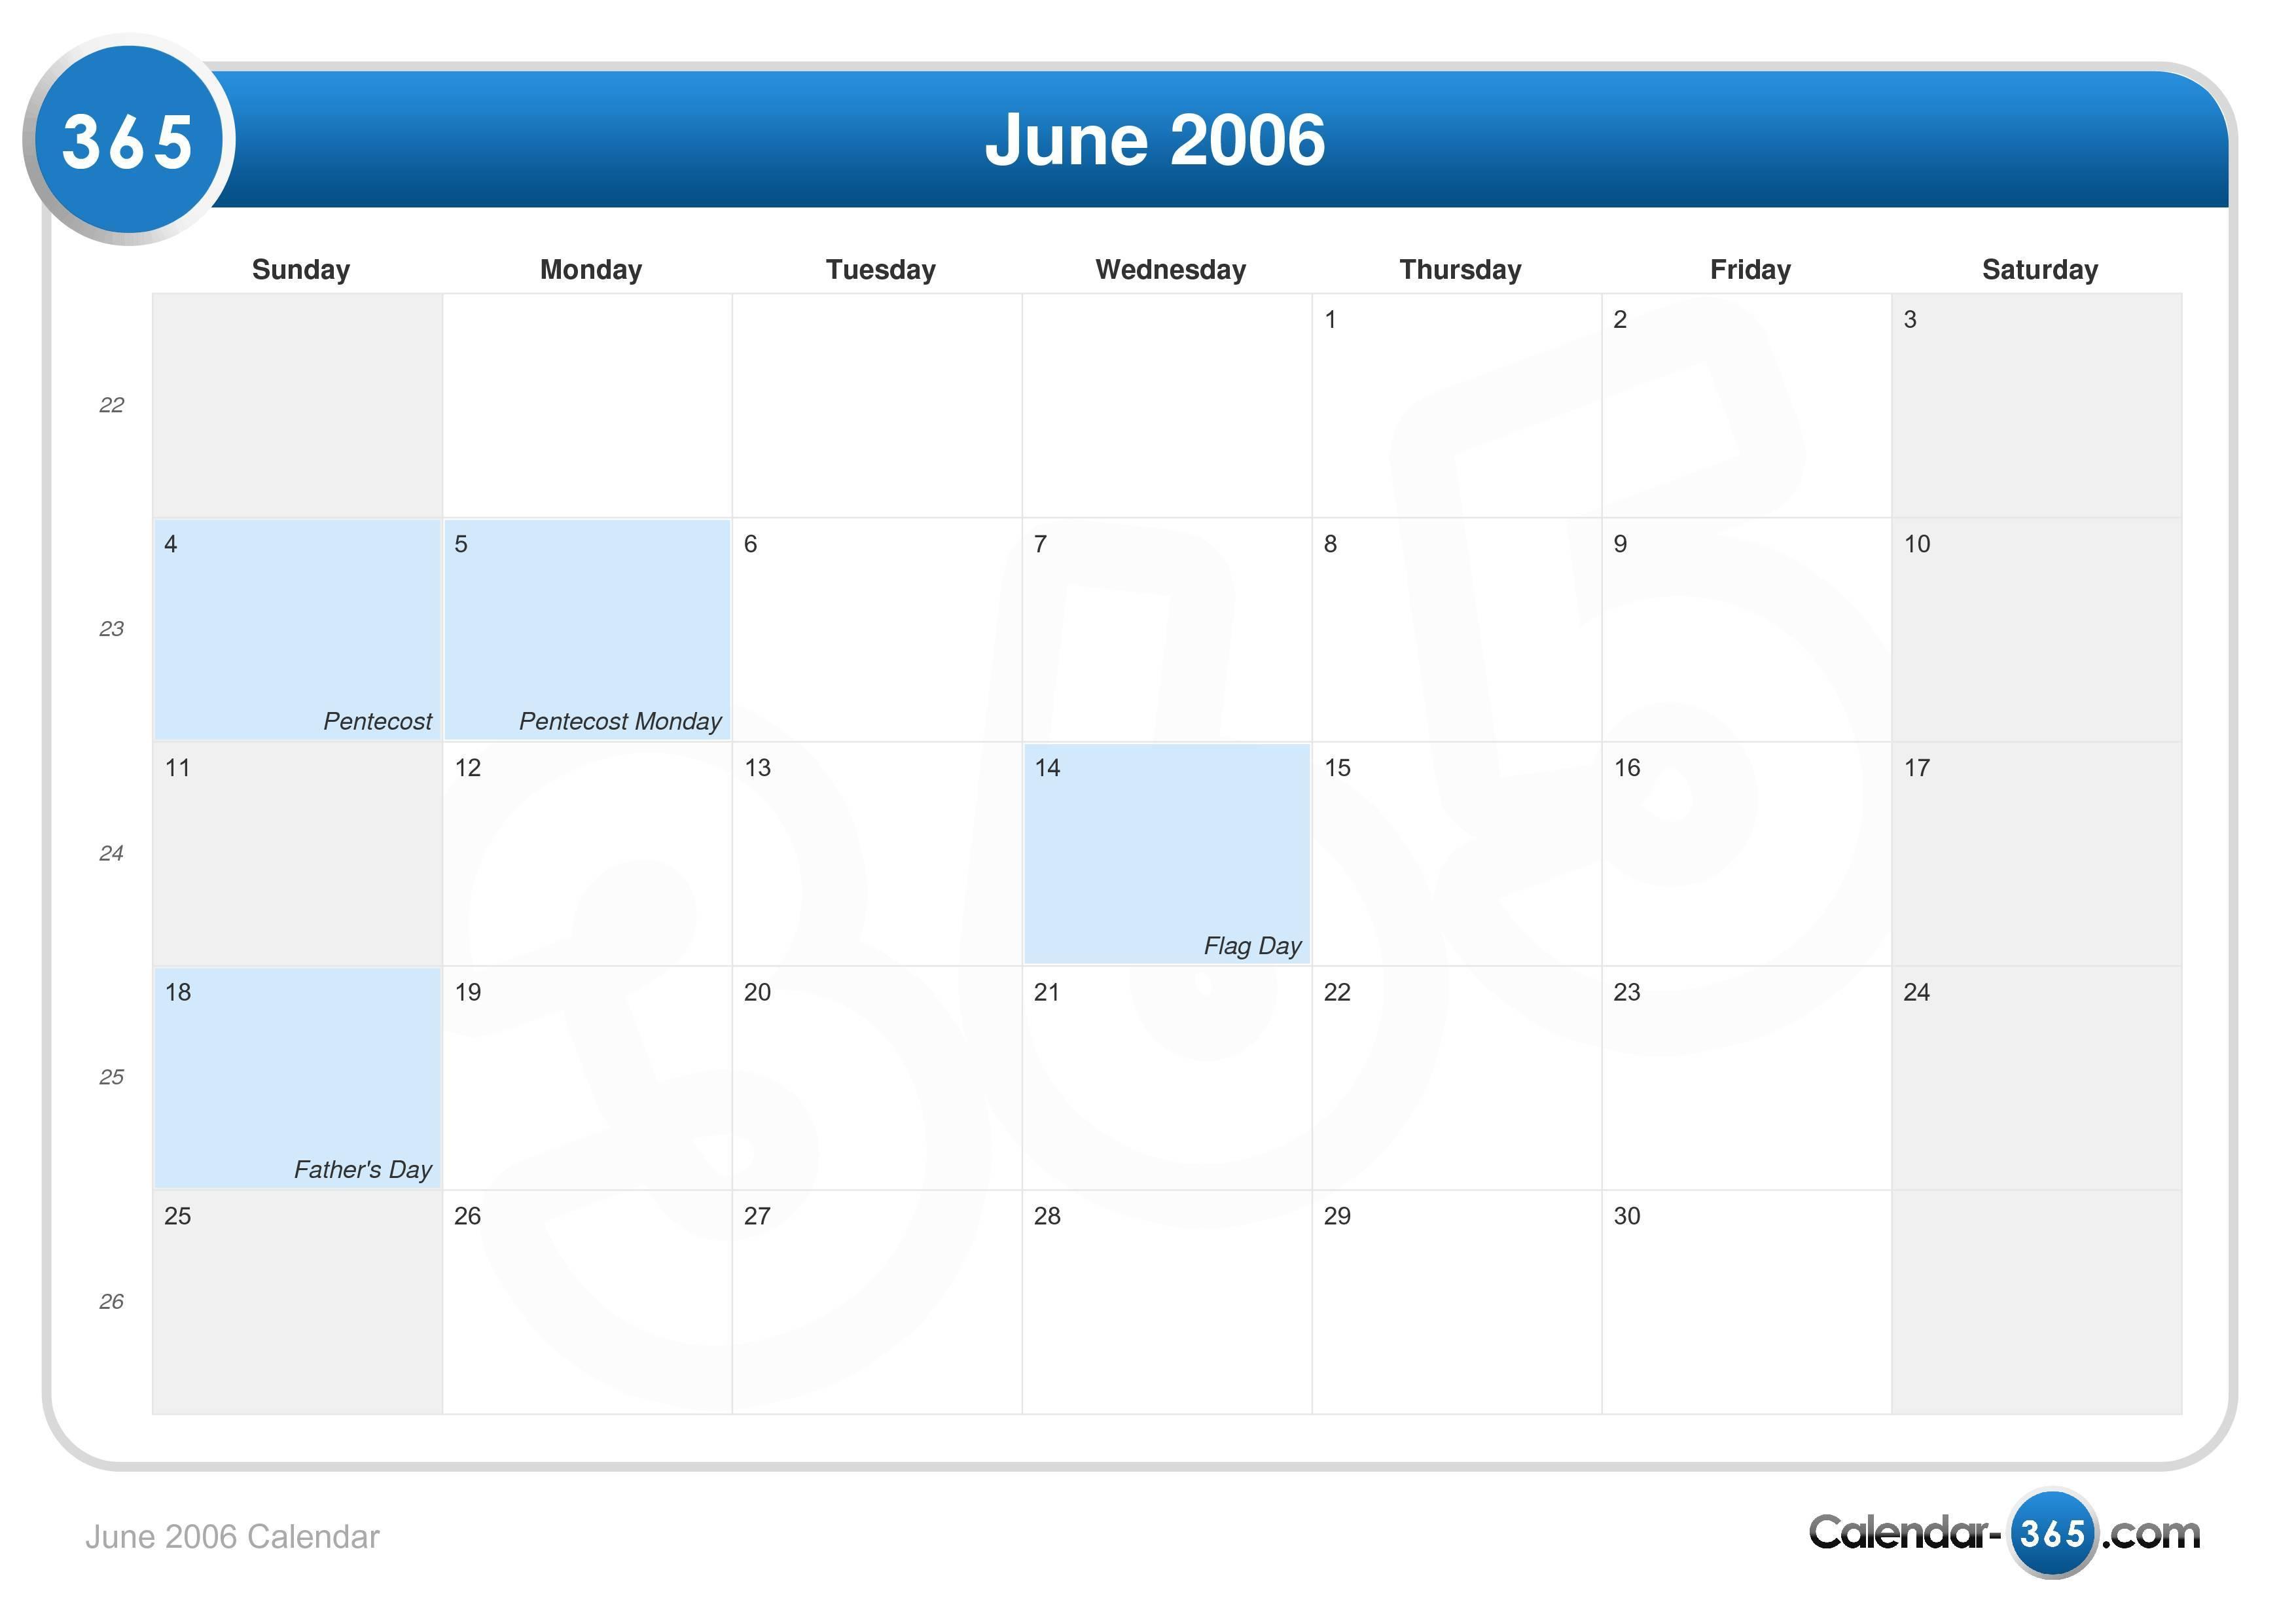 June 2006 Calendar